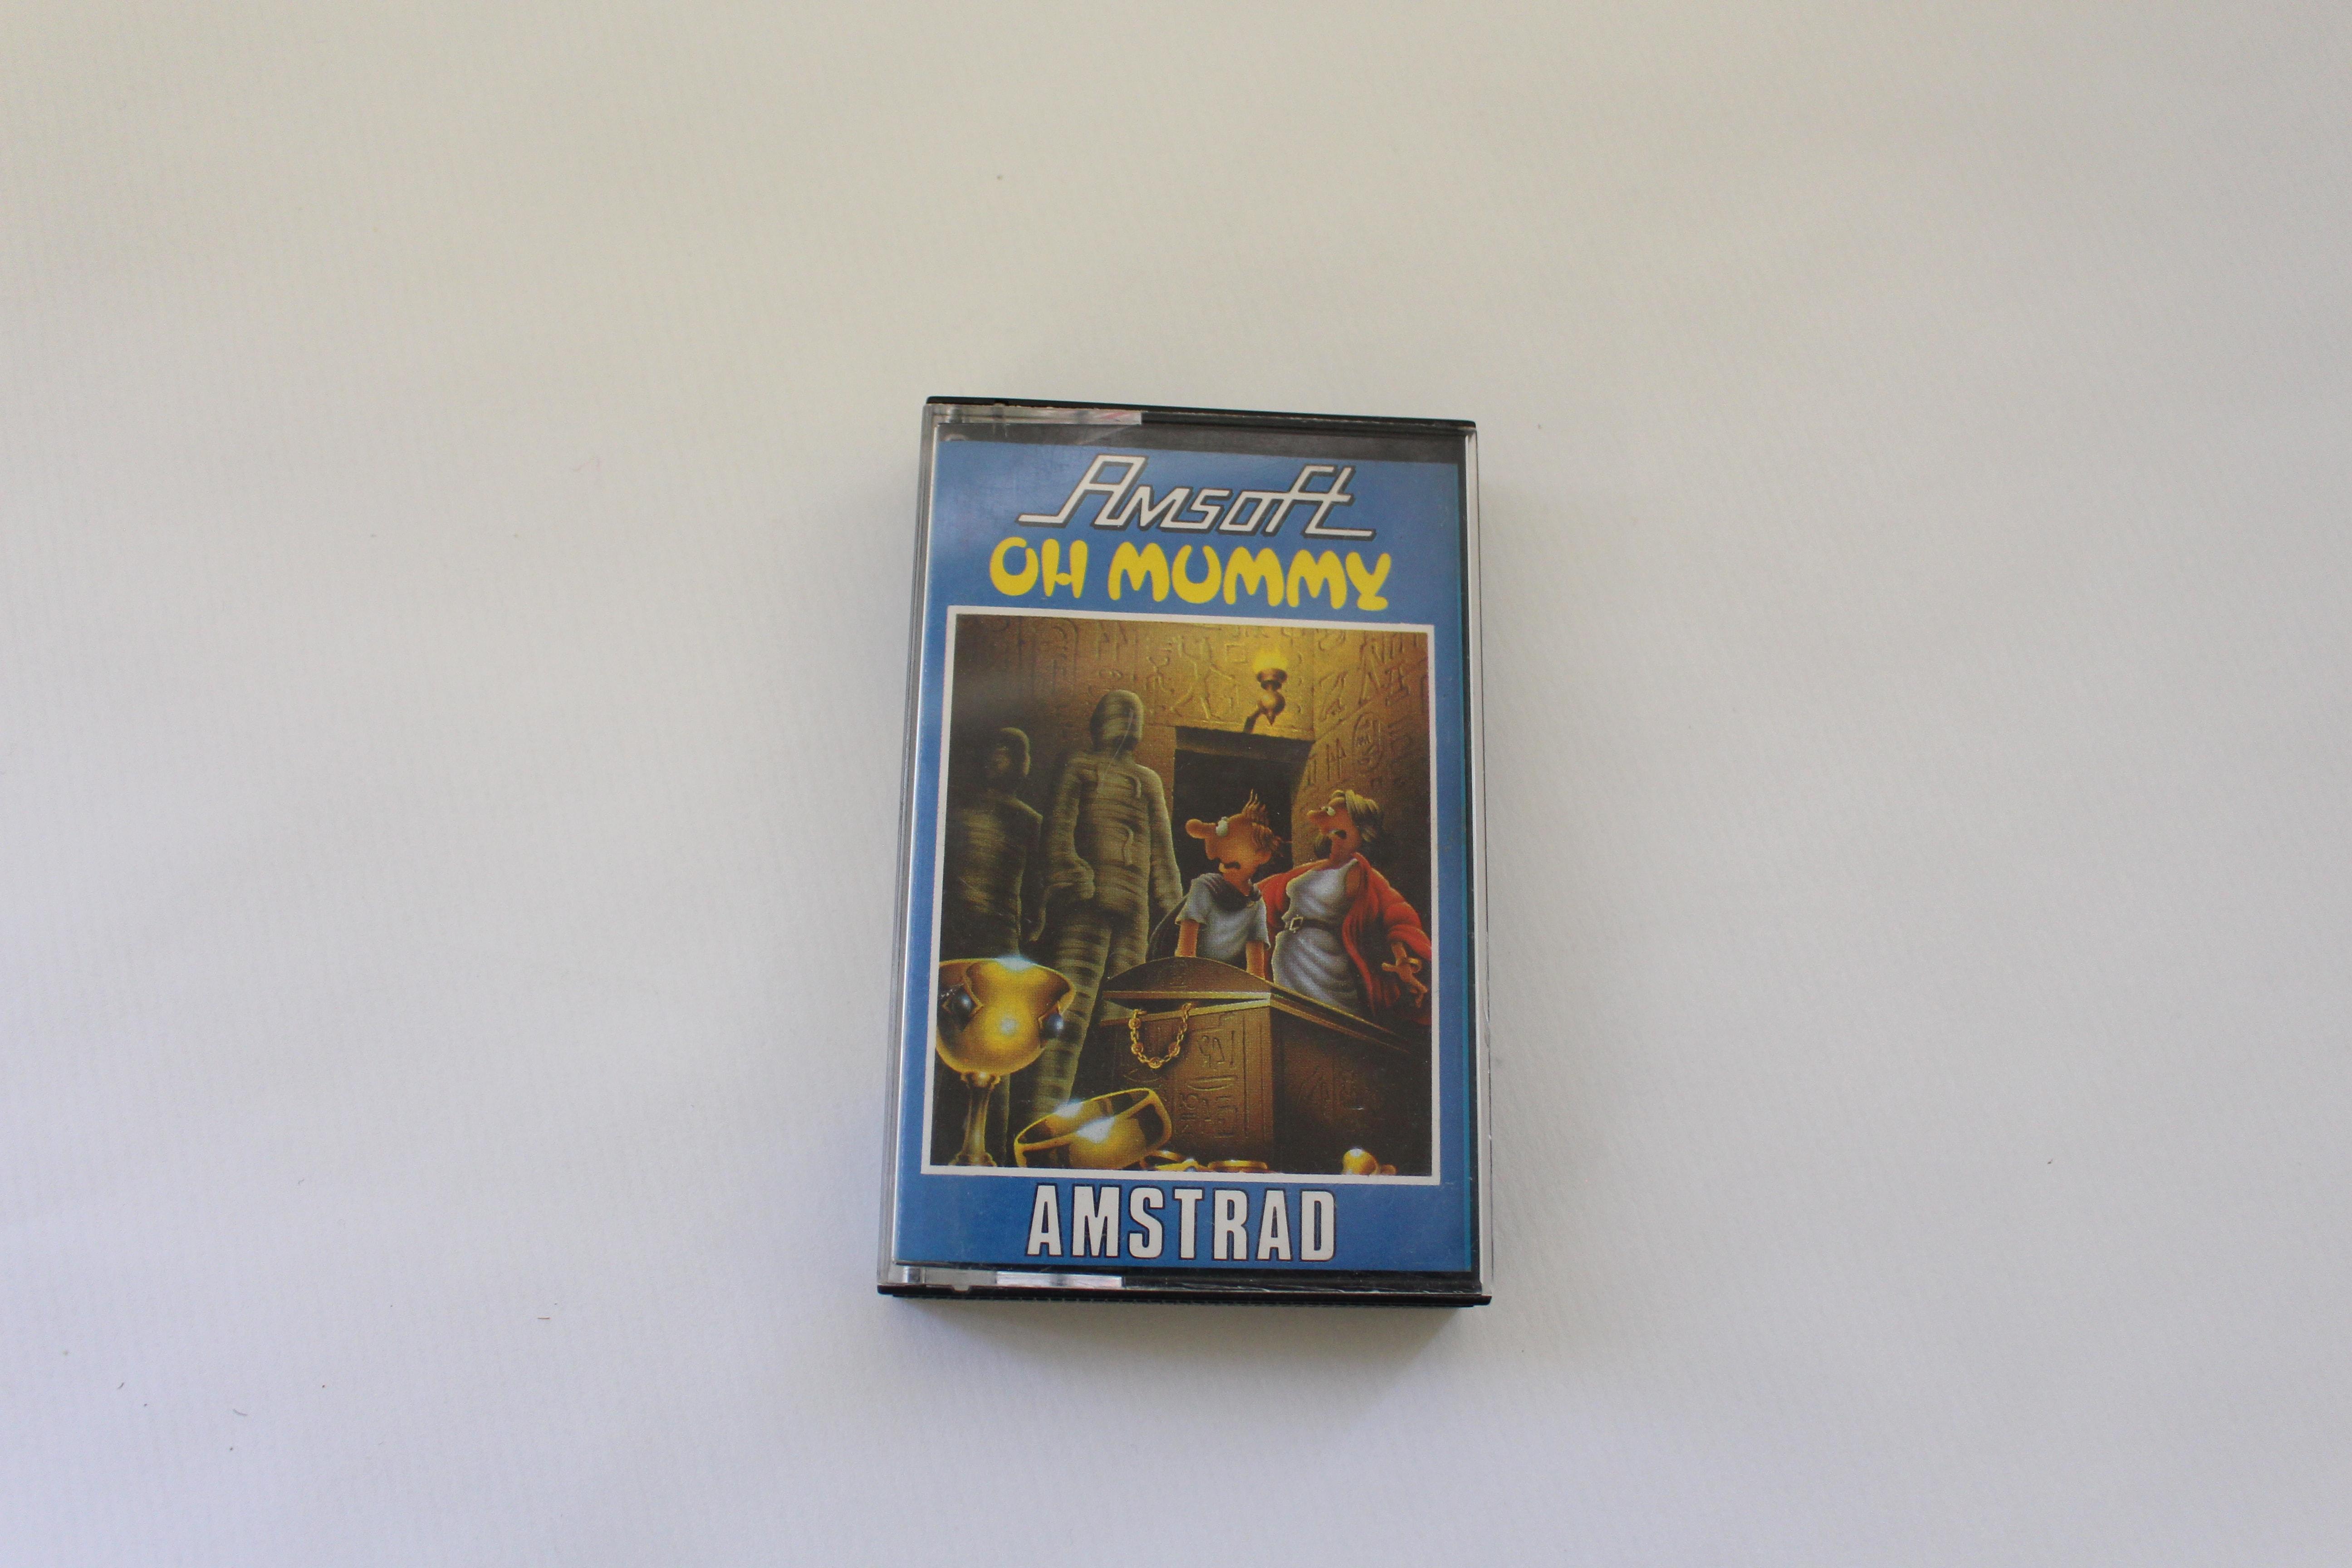 cassette oh mummy amstrad de amsoft